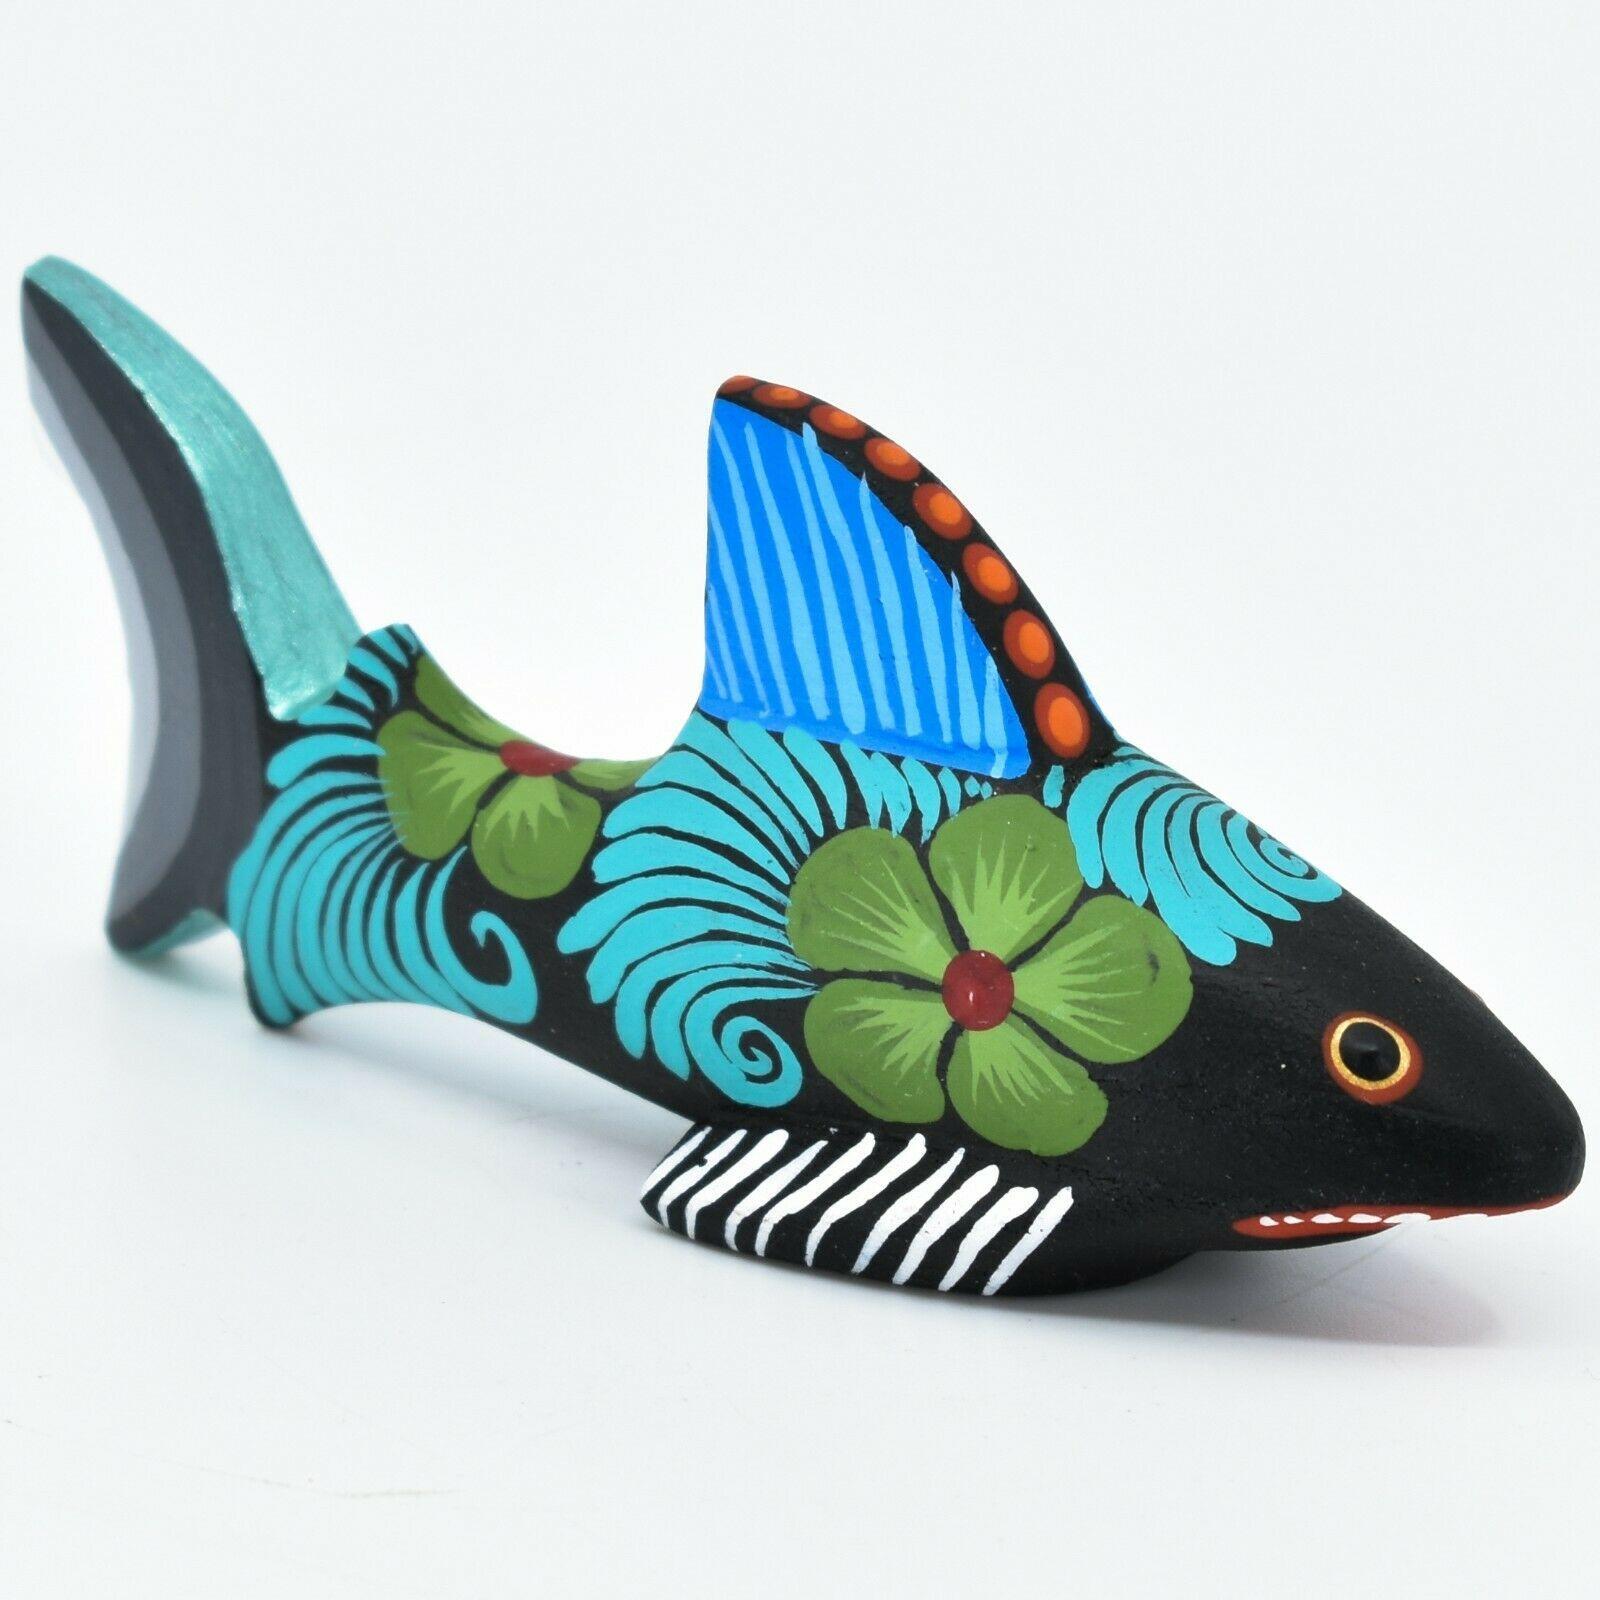 Handmade Alebrijes Oaxacan Copal Wood Carving Painted Folk Art Shark Figurine